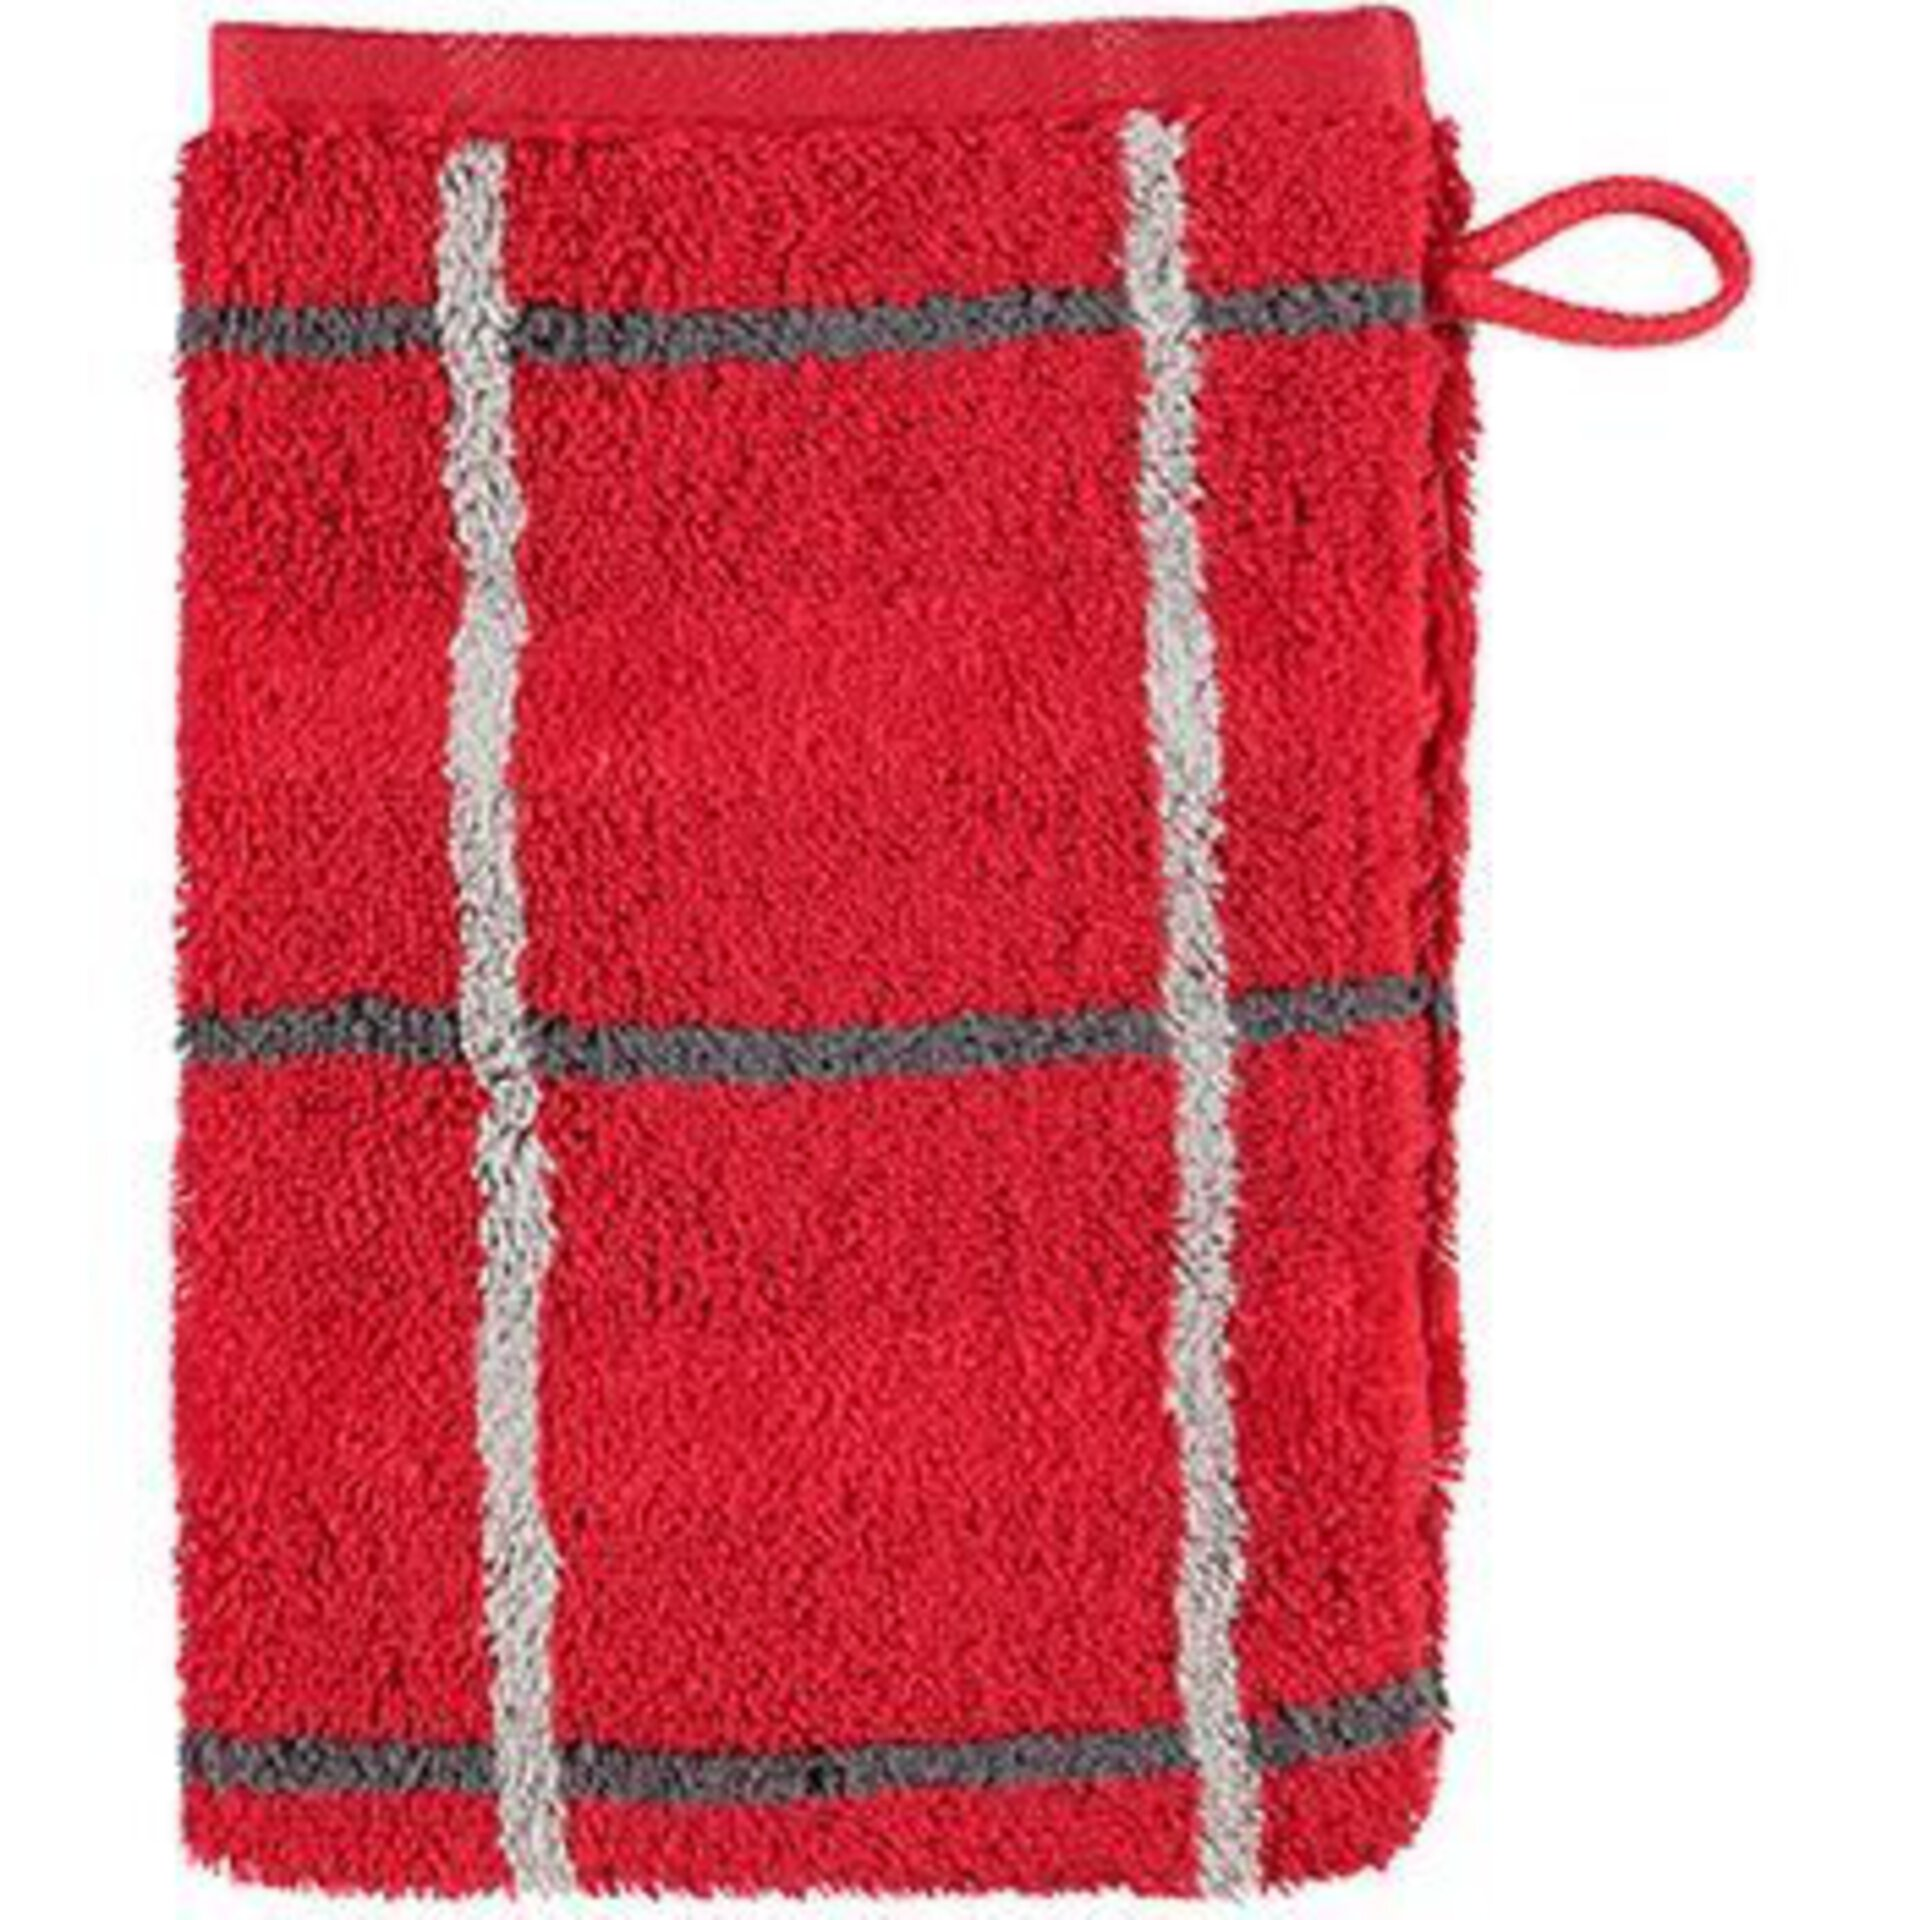 Waschhandschuh Noblesse Square Cawö Textil 16 x 22 cm